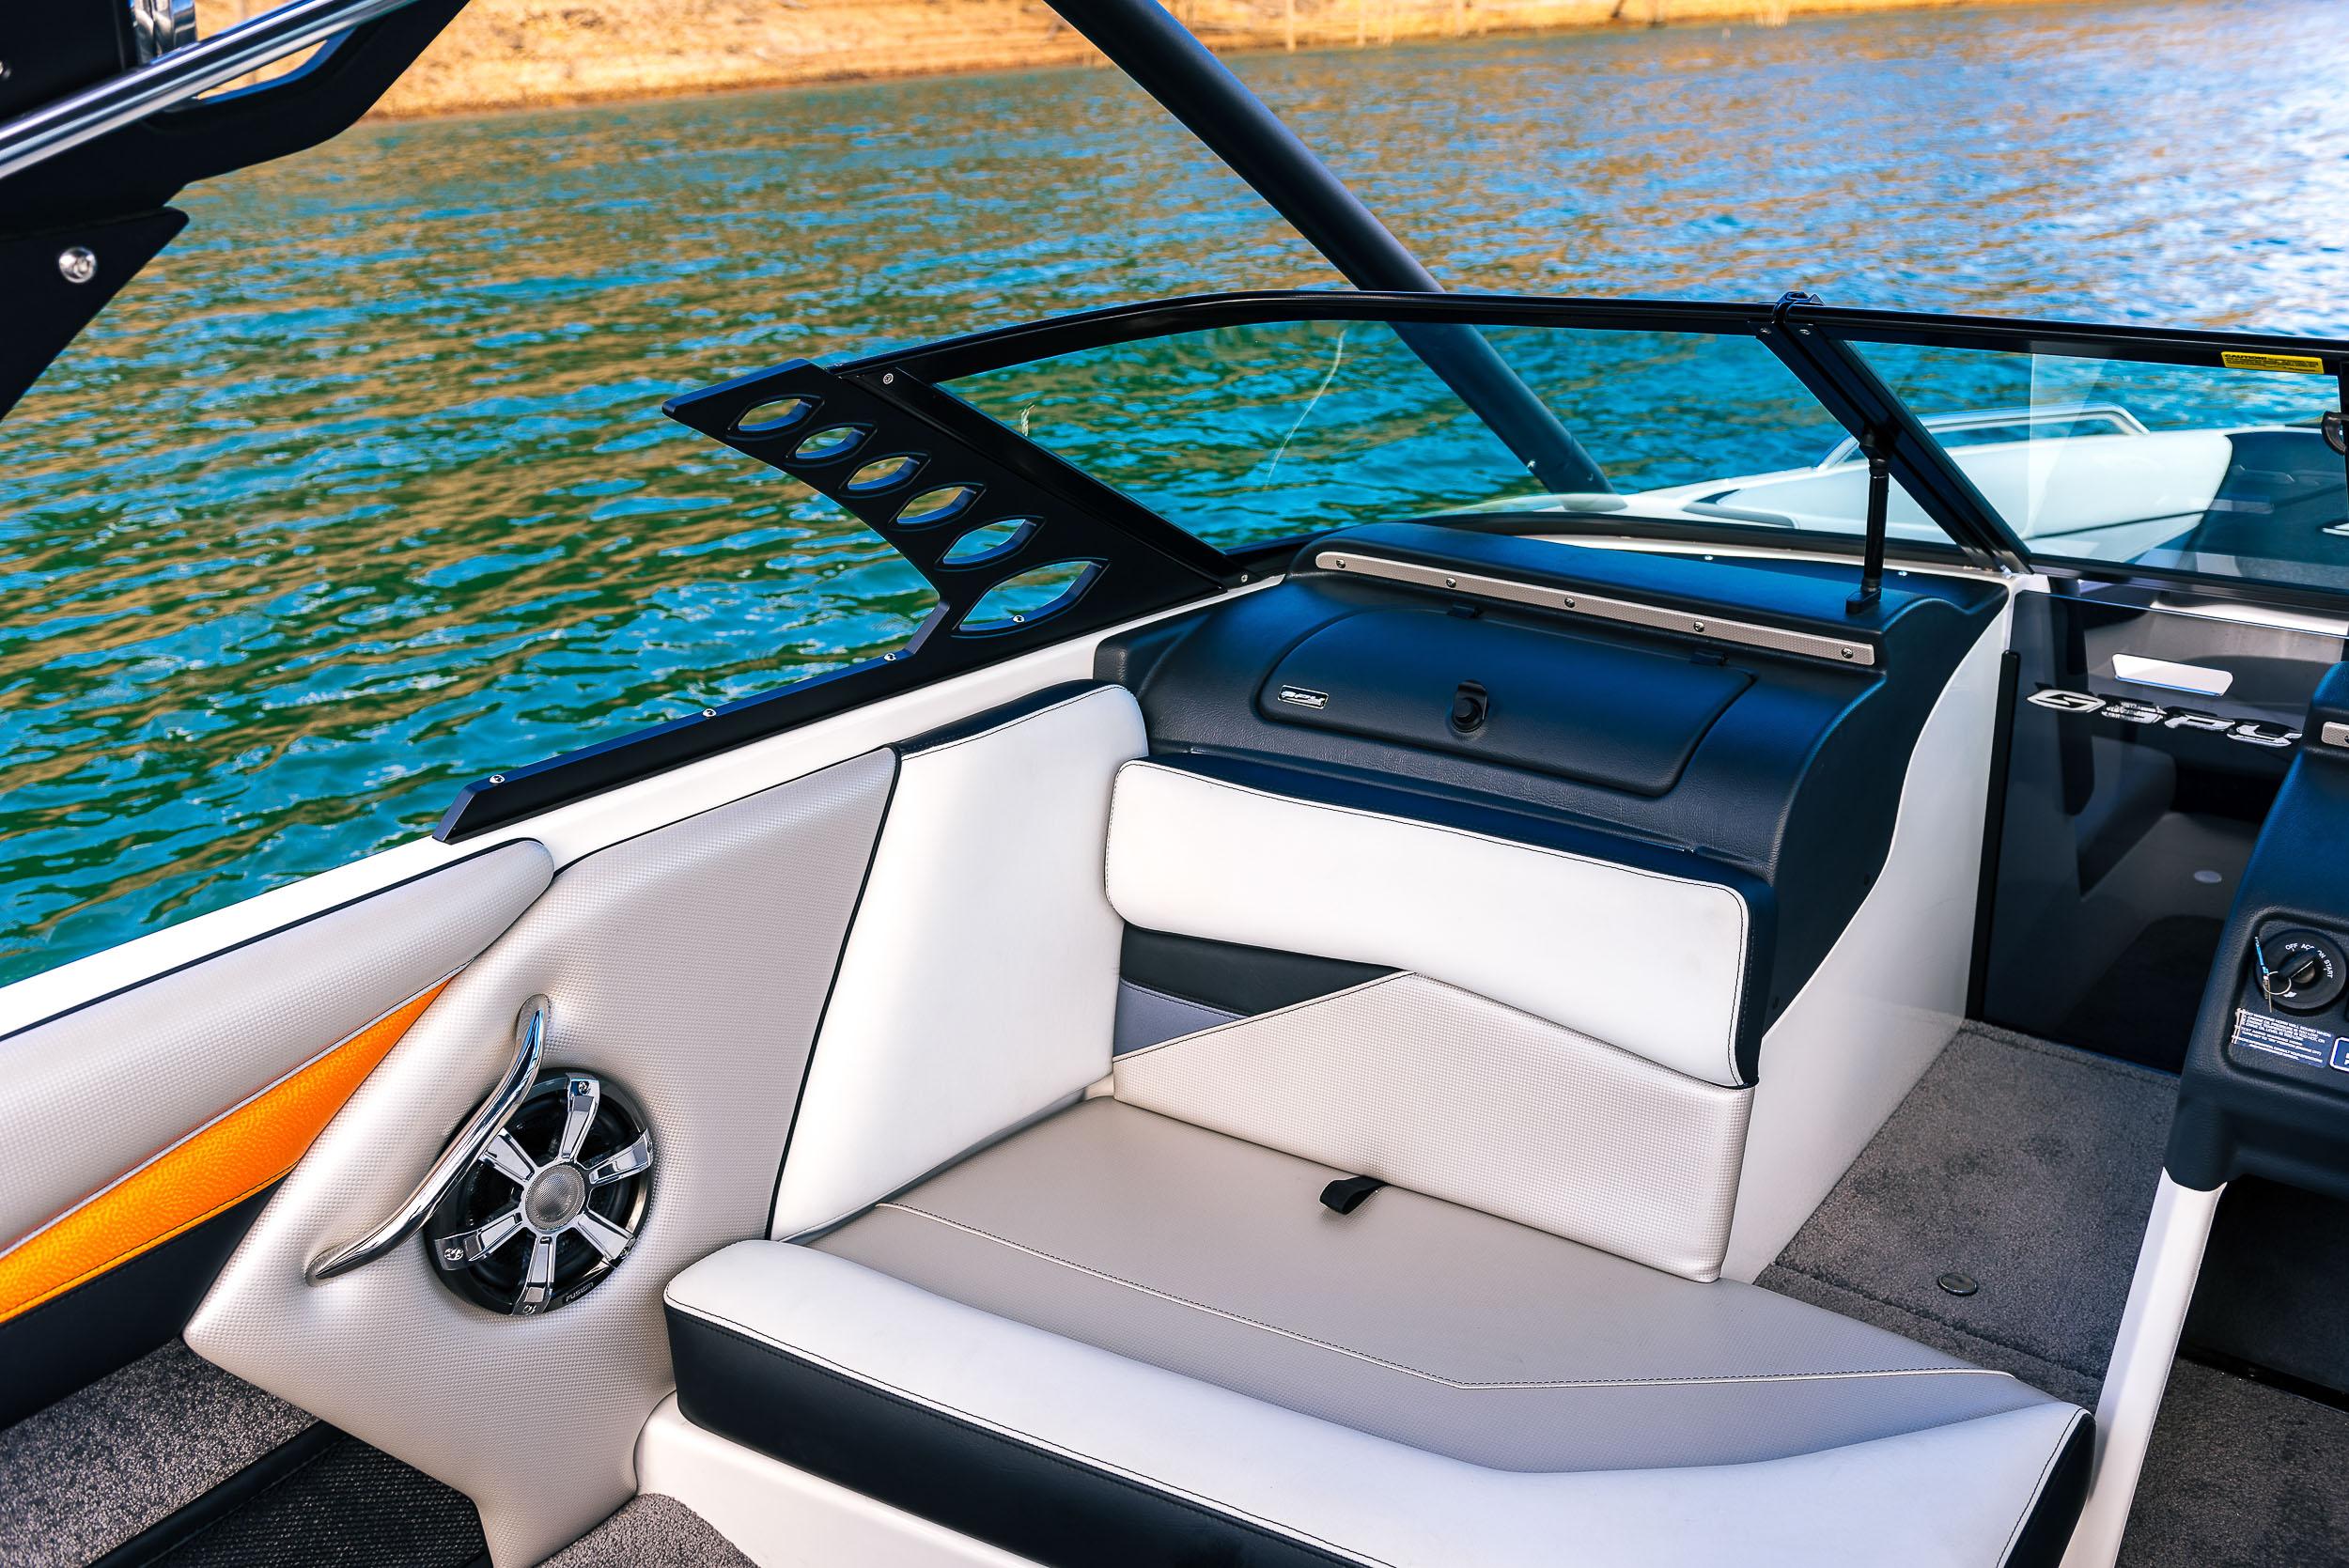 Spy_Boats_XS21-24.jpg